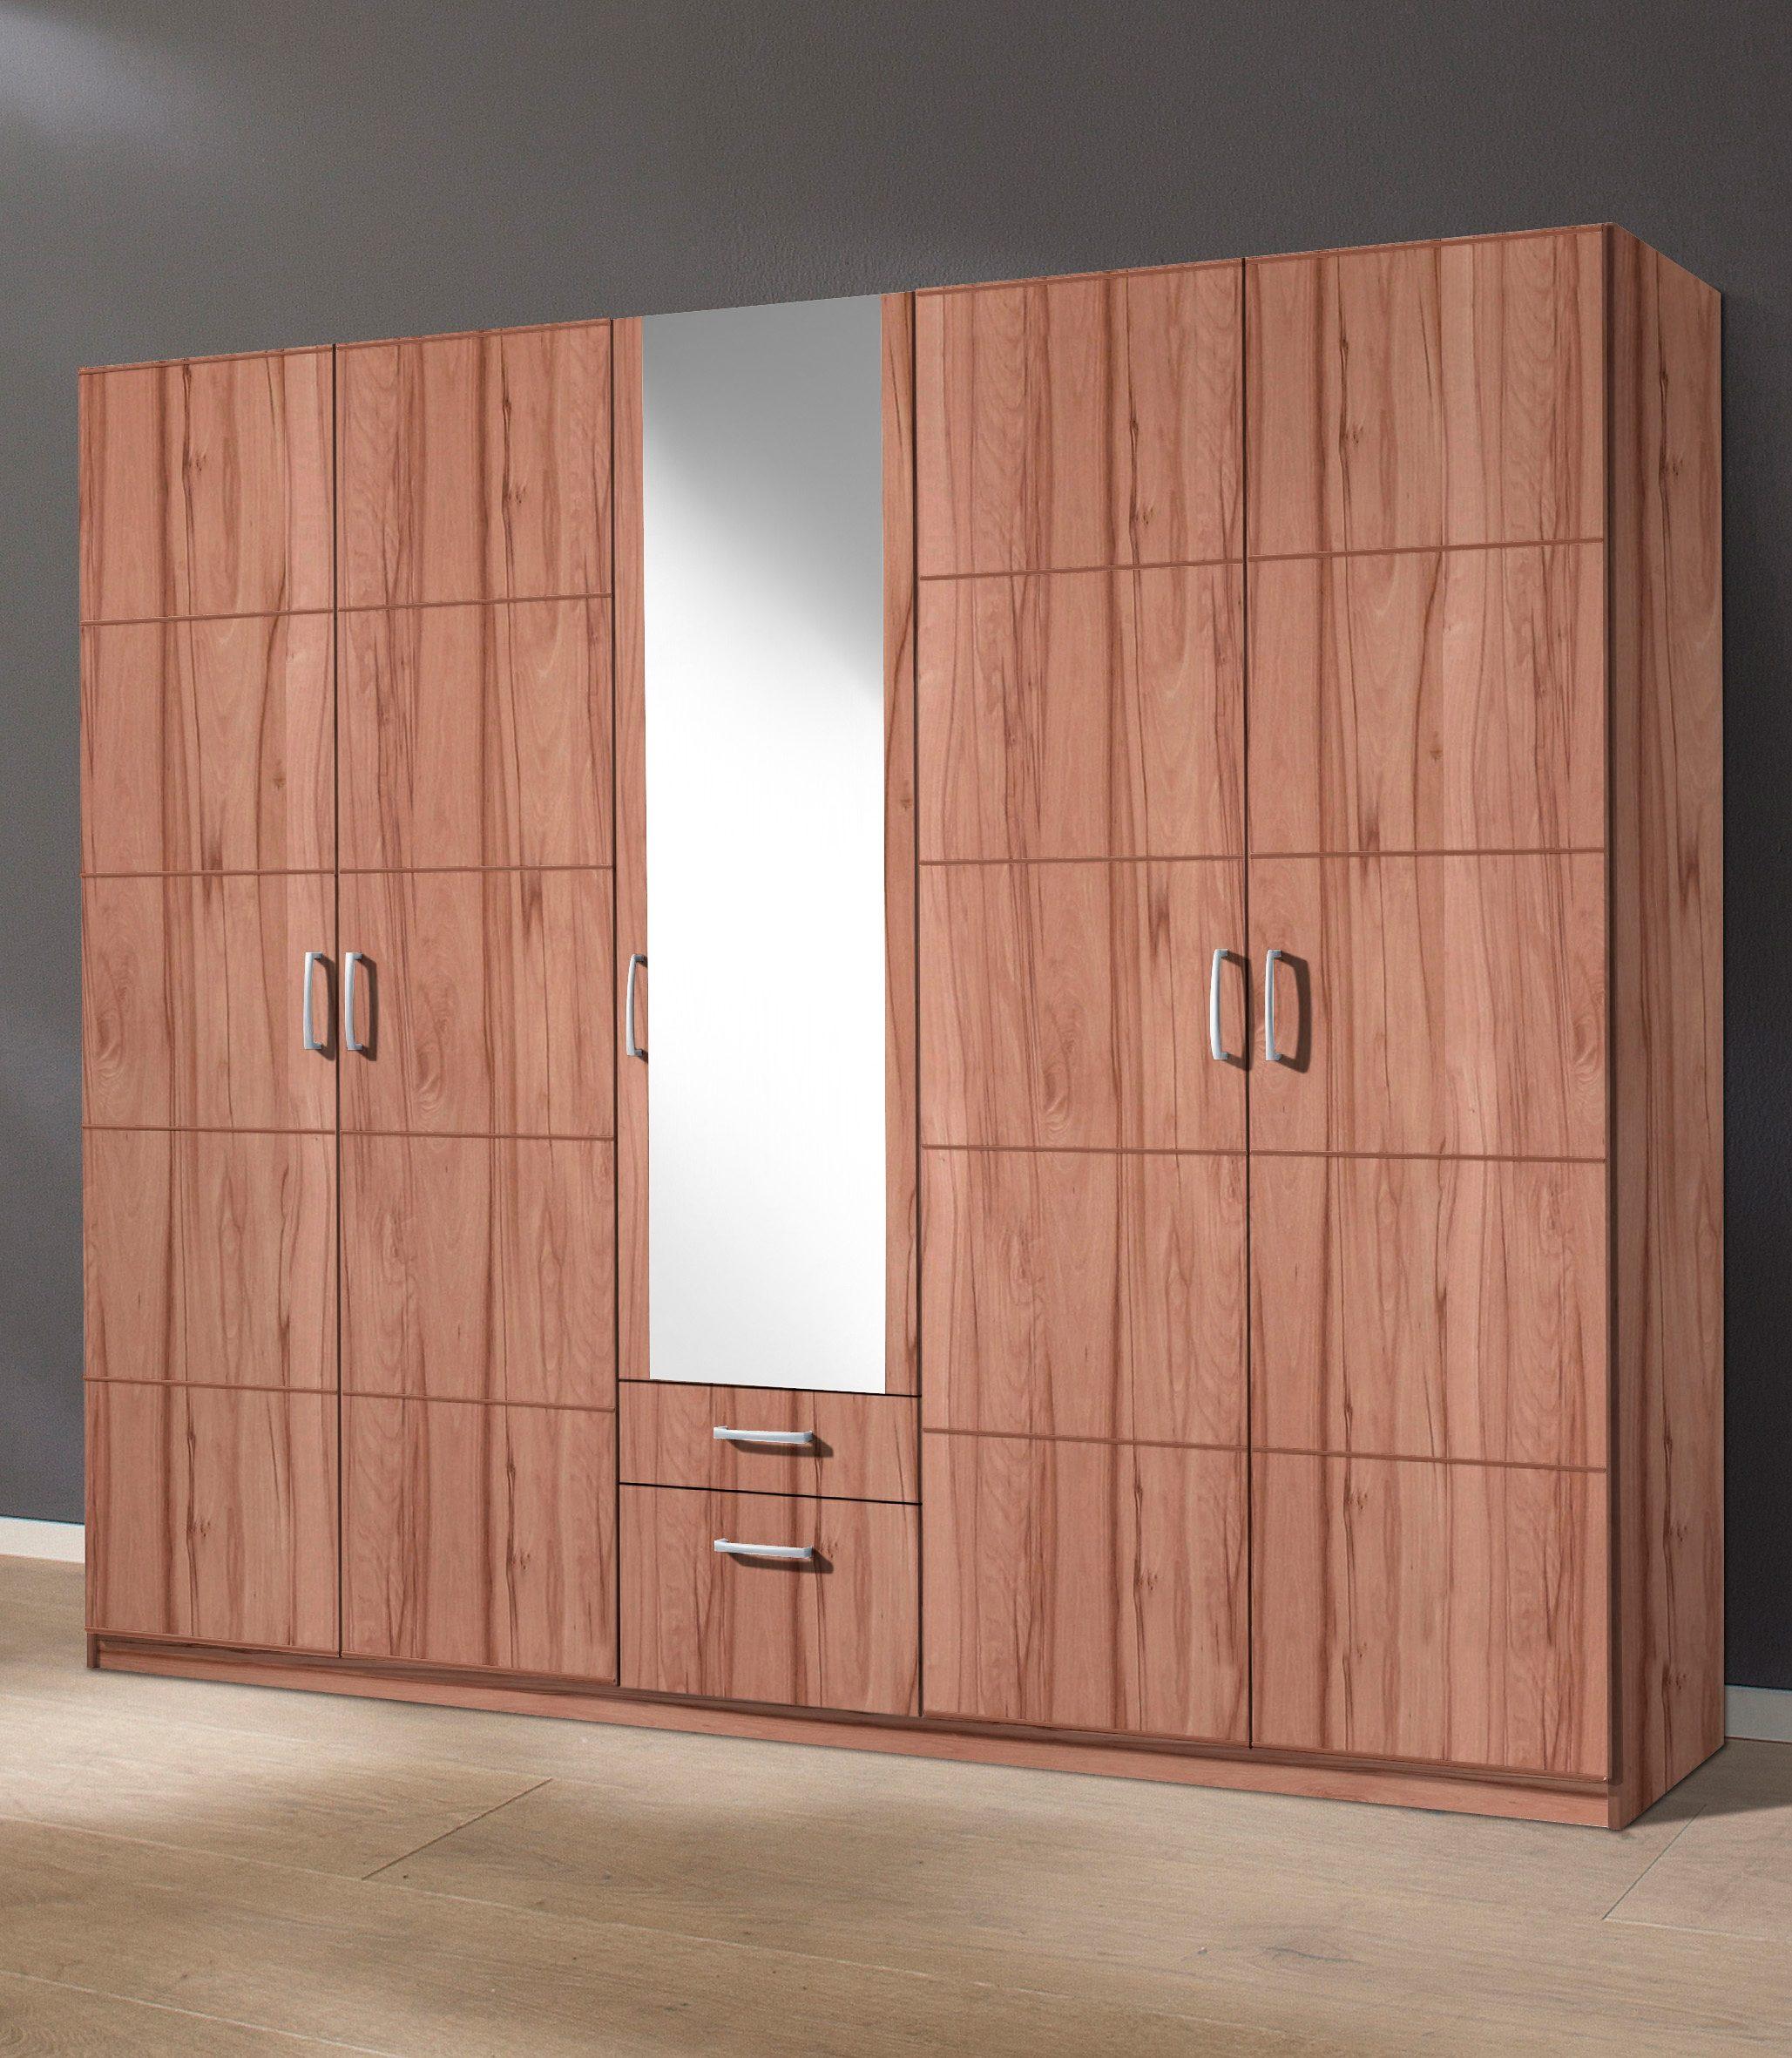 kleiderschrank bilbao billiger bei. Black Bedroom Furniture Sets. Home Design Ideas